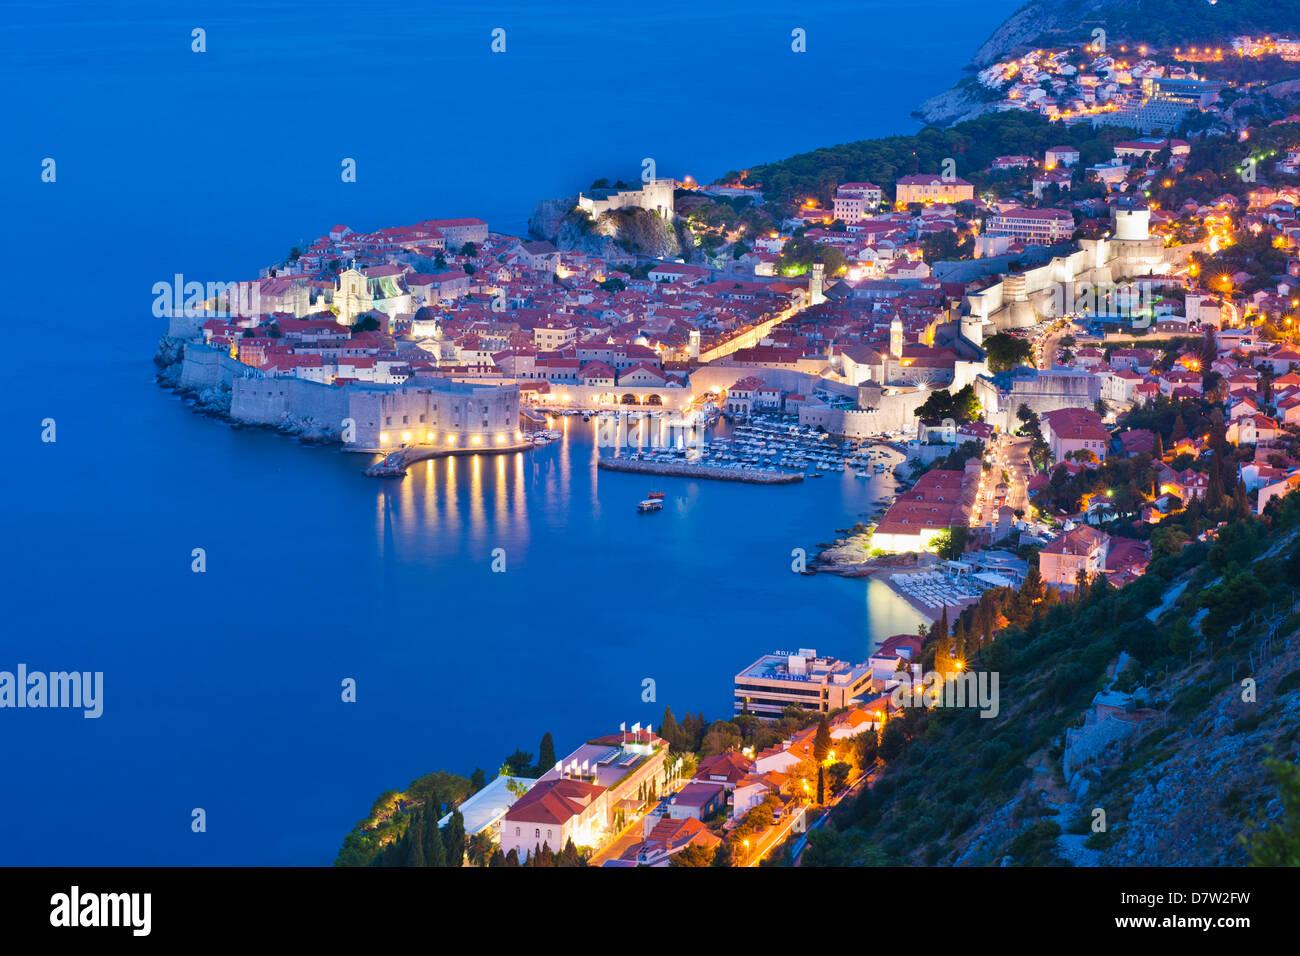 Dubrovnik Old Town at night, taken from Zarkovica Hill, Dalmatian Coast, Adriatic, Croatia - Stock Image